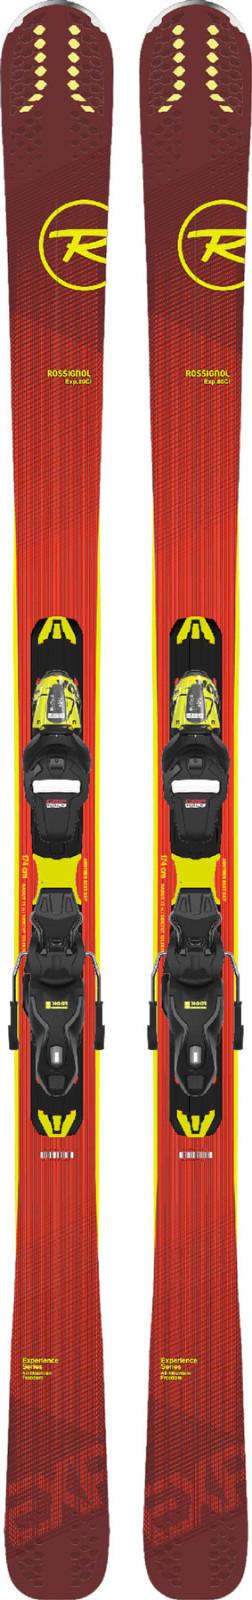 Rossignol Experience 80 Ci Xpress + Xpress 11 GW